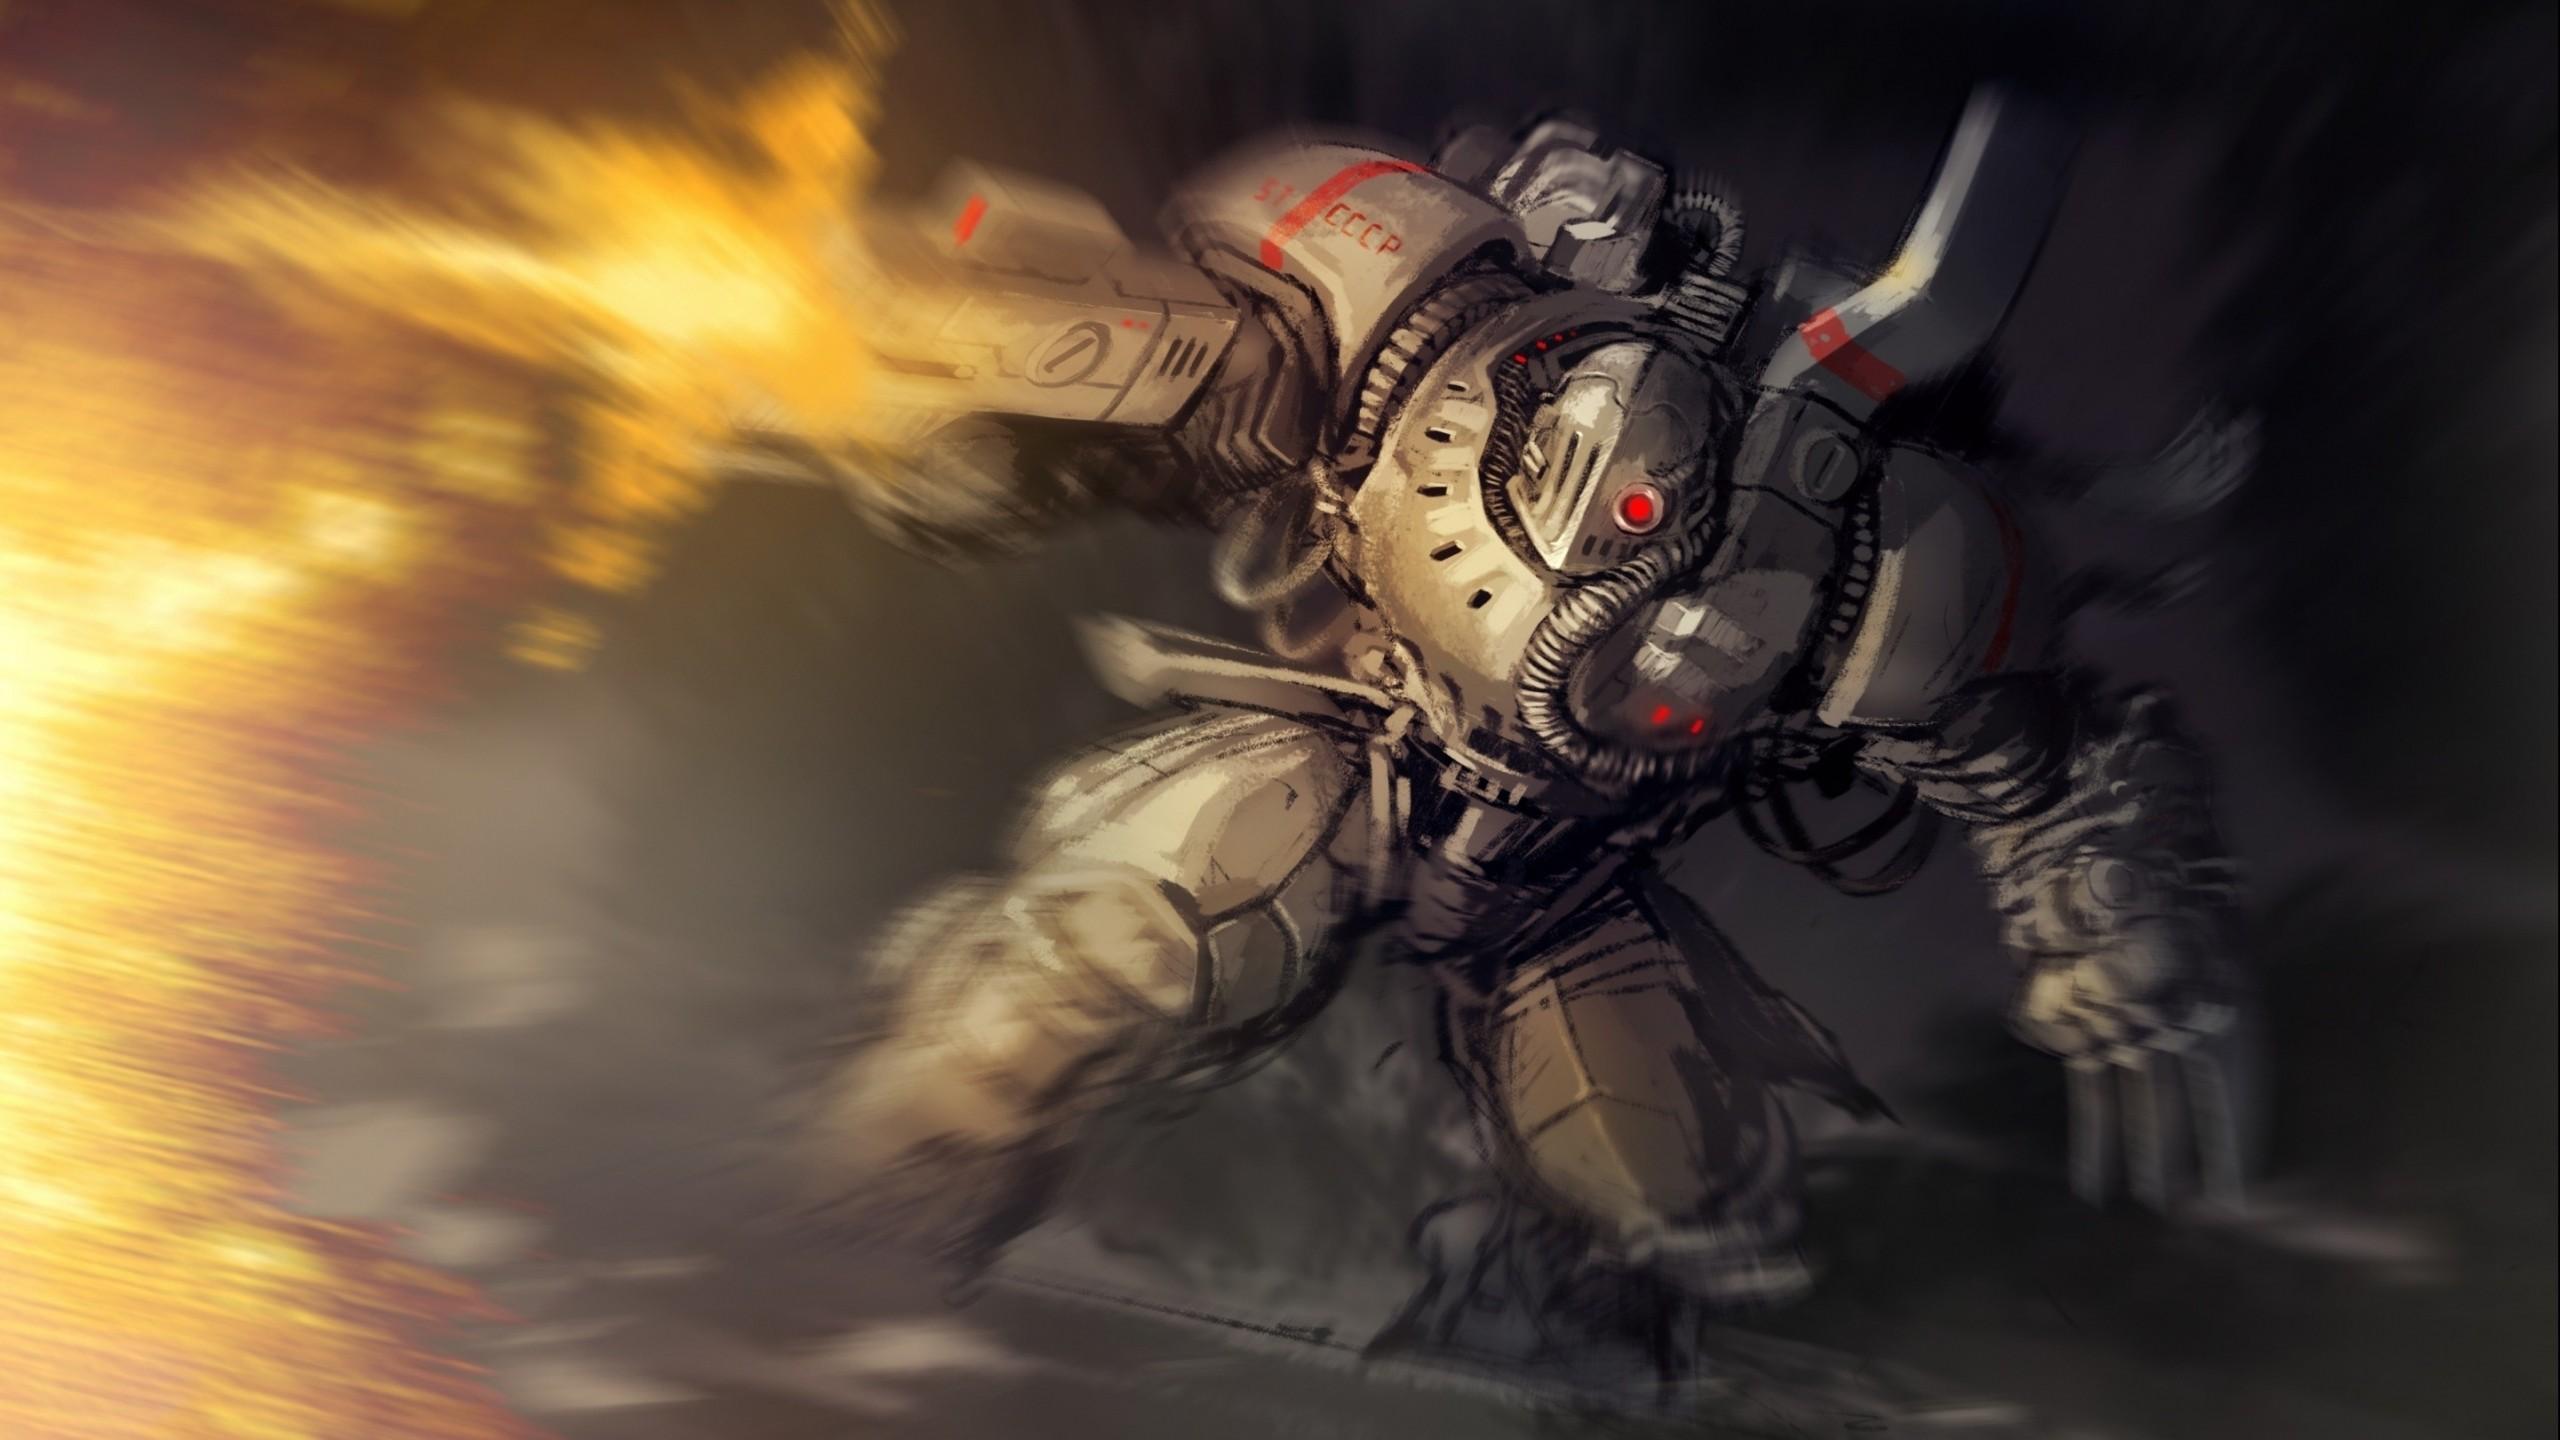 Hintergrundbilder Cyberpunk Anime Kunstwerk Rüstung Mech